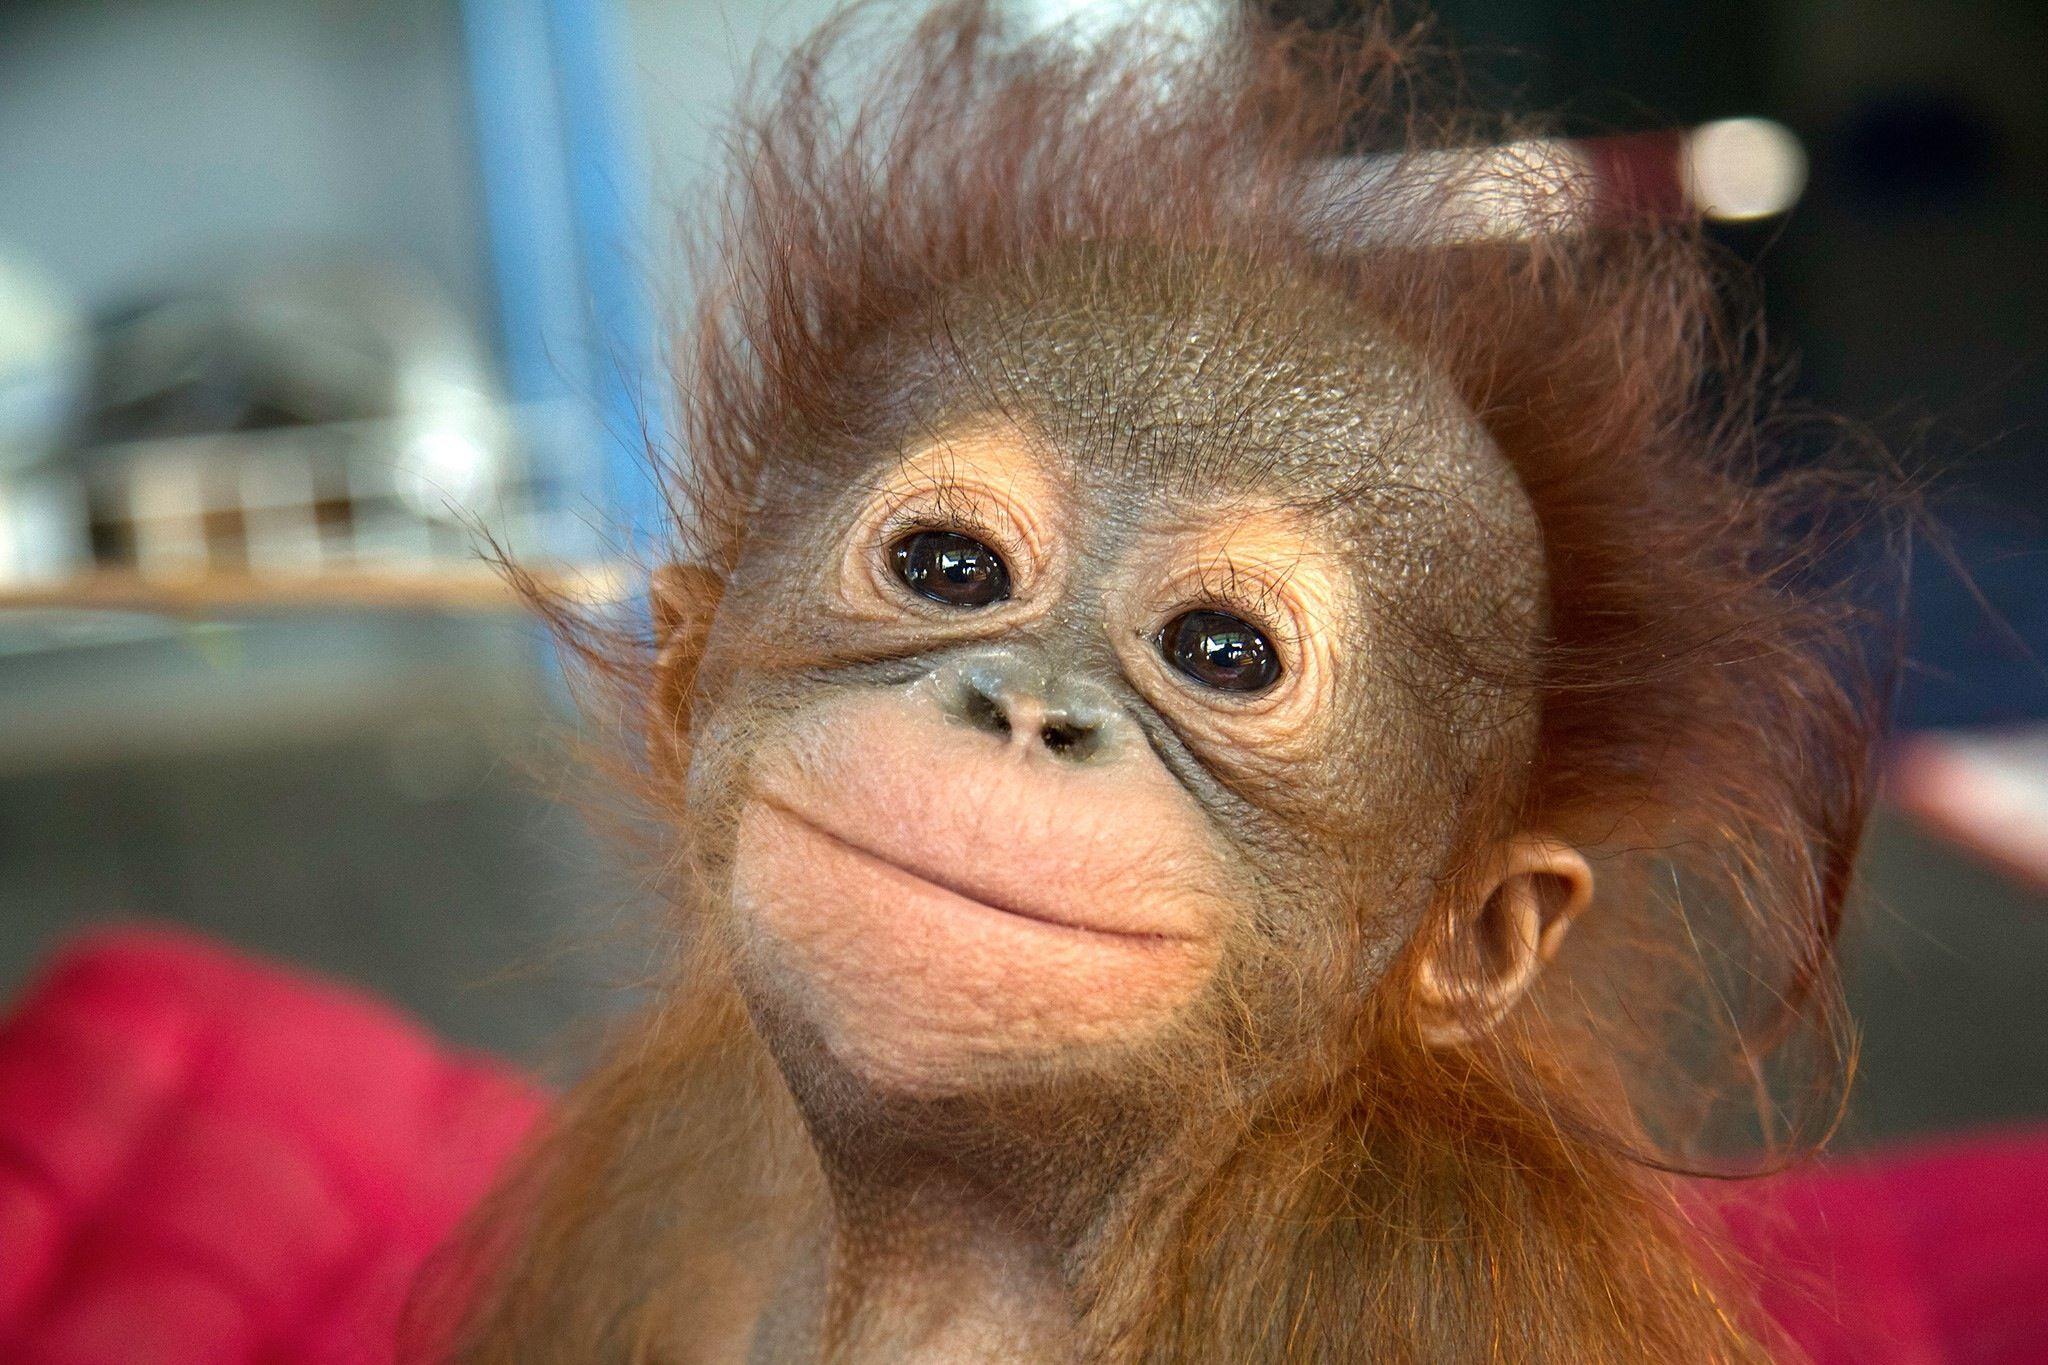 Baby orangutan (With images) Cute animals, Happy animals